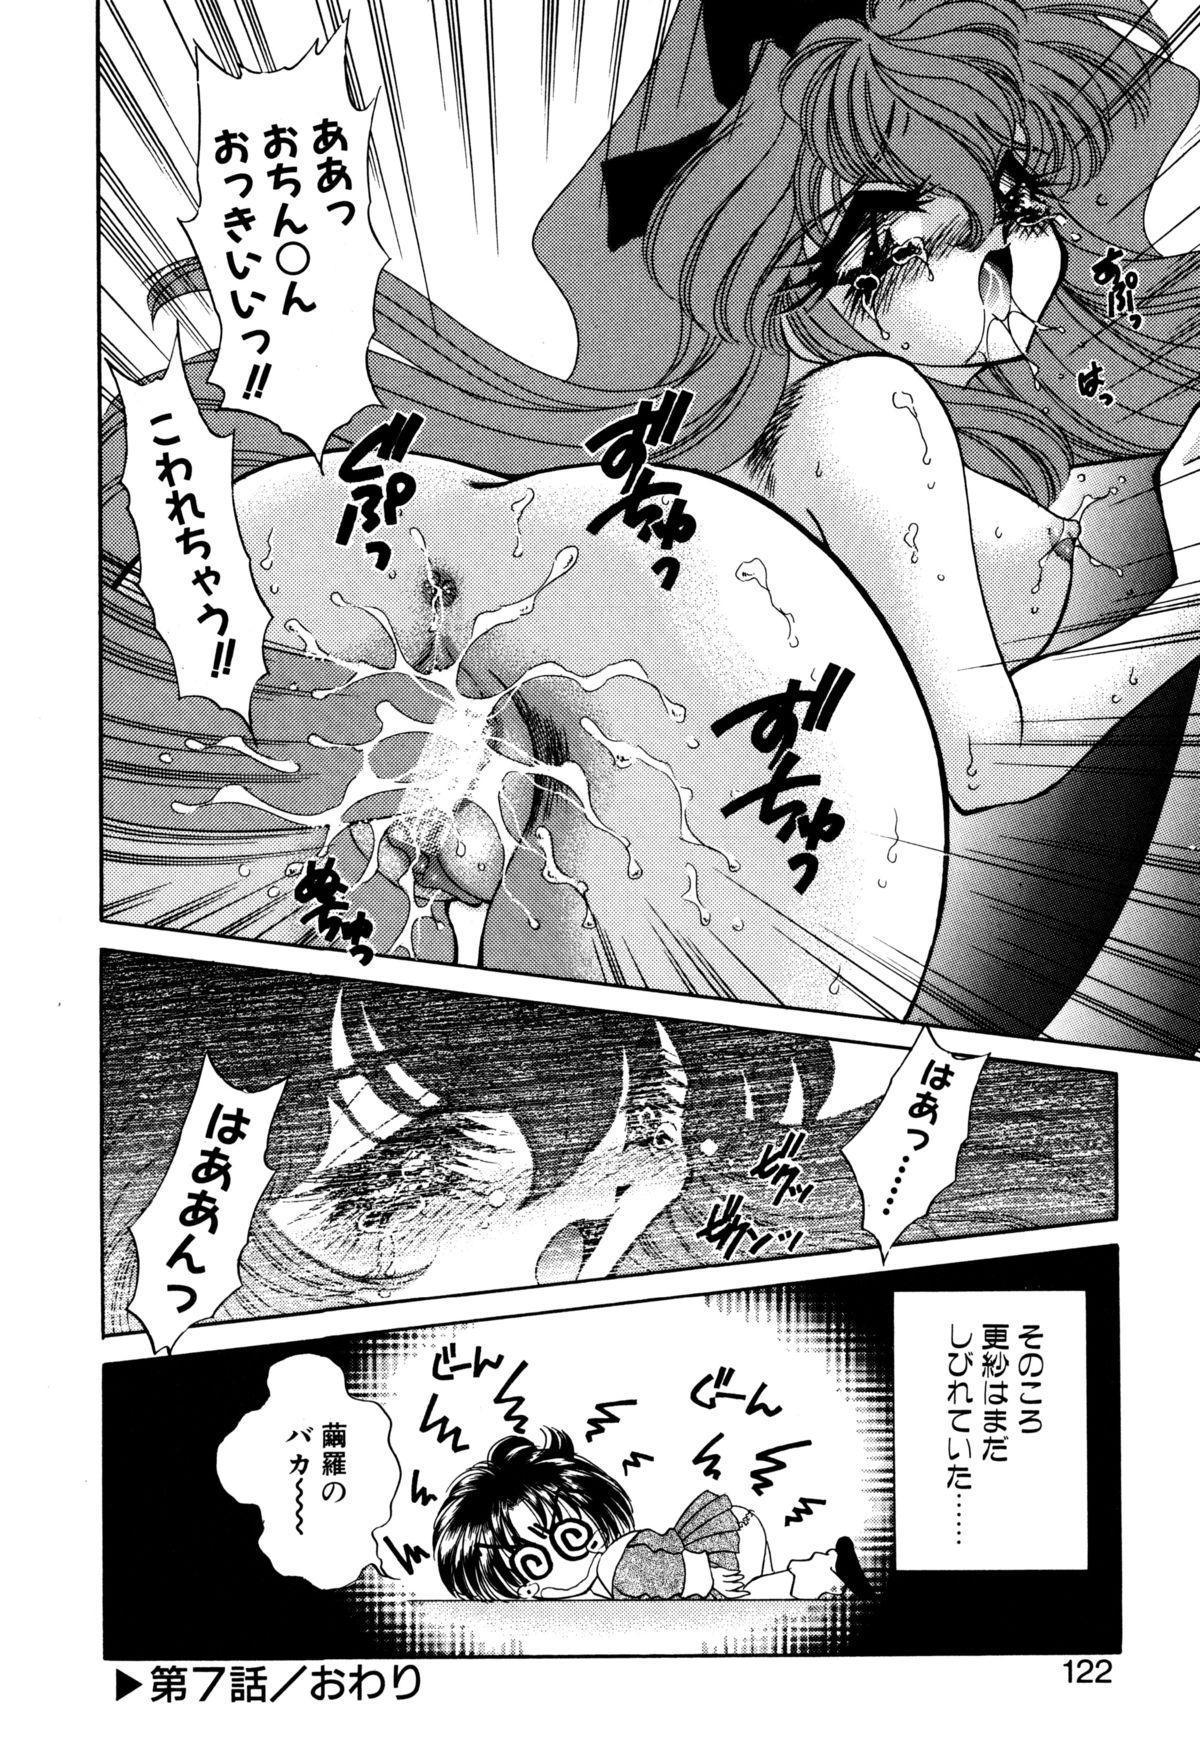 Kigurumi Sentai Quiltian 120